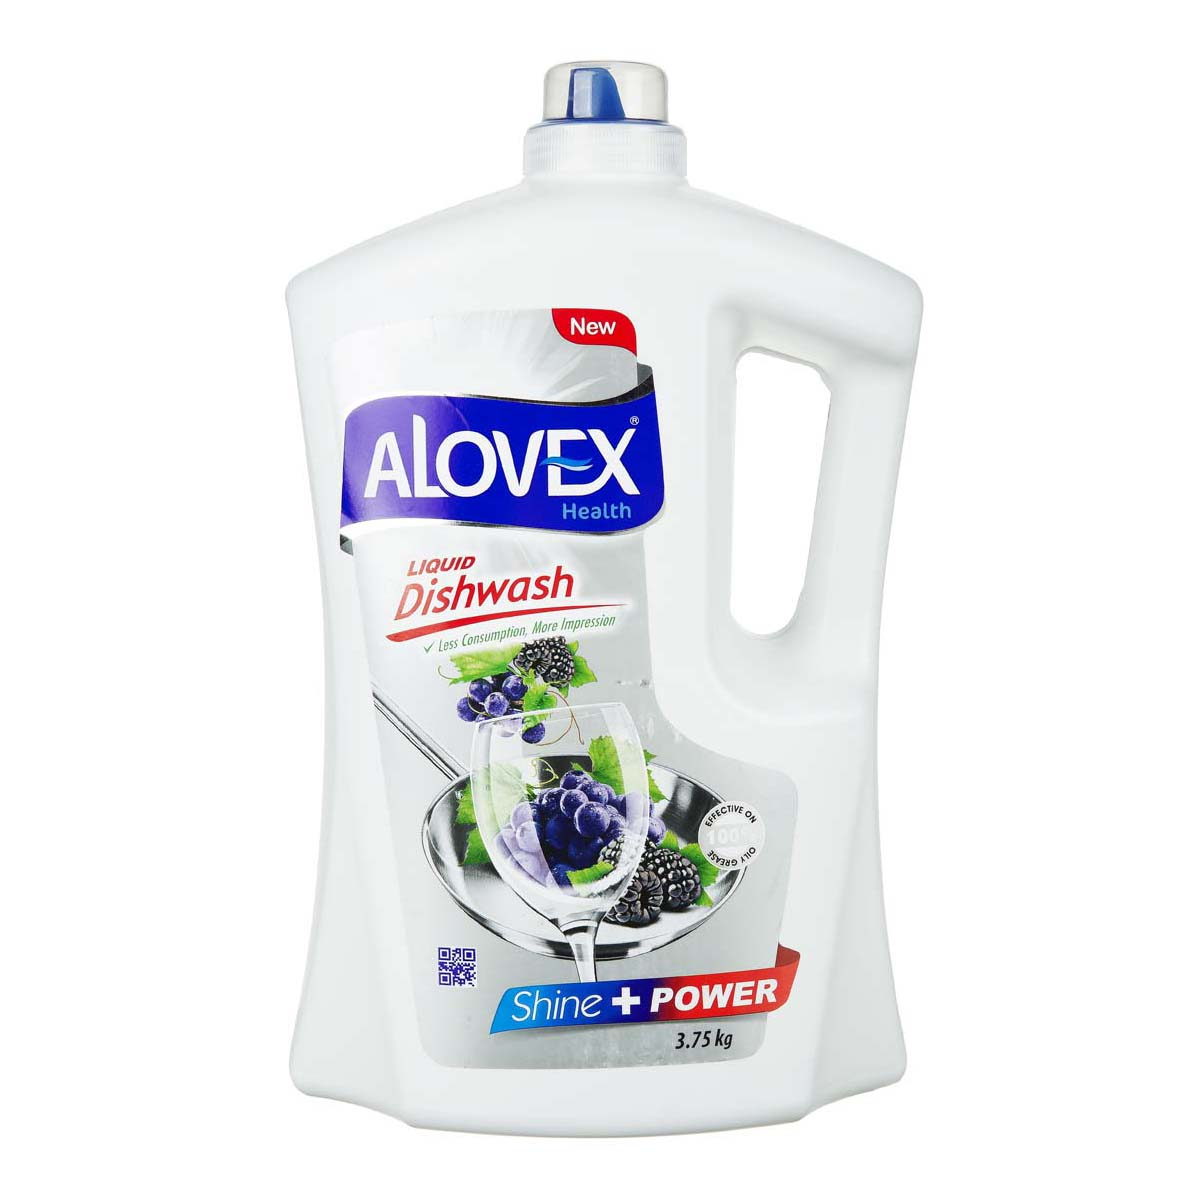 مایع ظرفشویی آلوکس انگور و بلوبری 3750 گرمی - مایع ظرفشویی آلوکس انگور و بلوبری 3750 گرمی